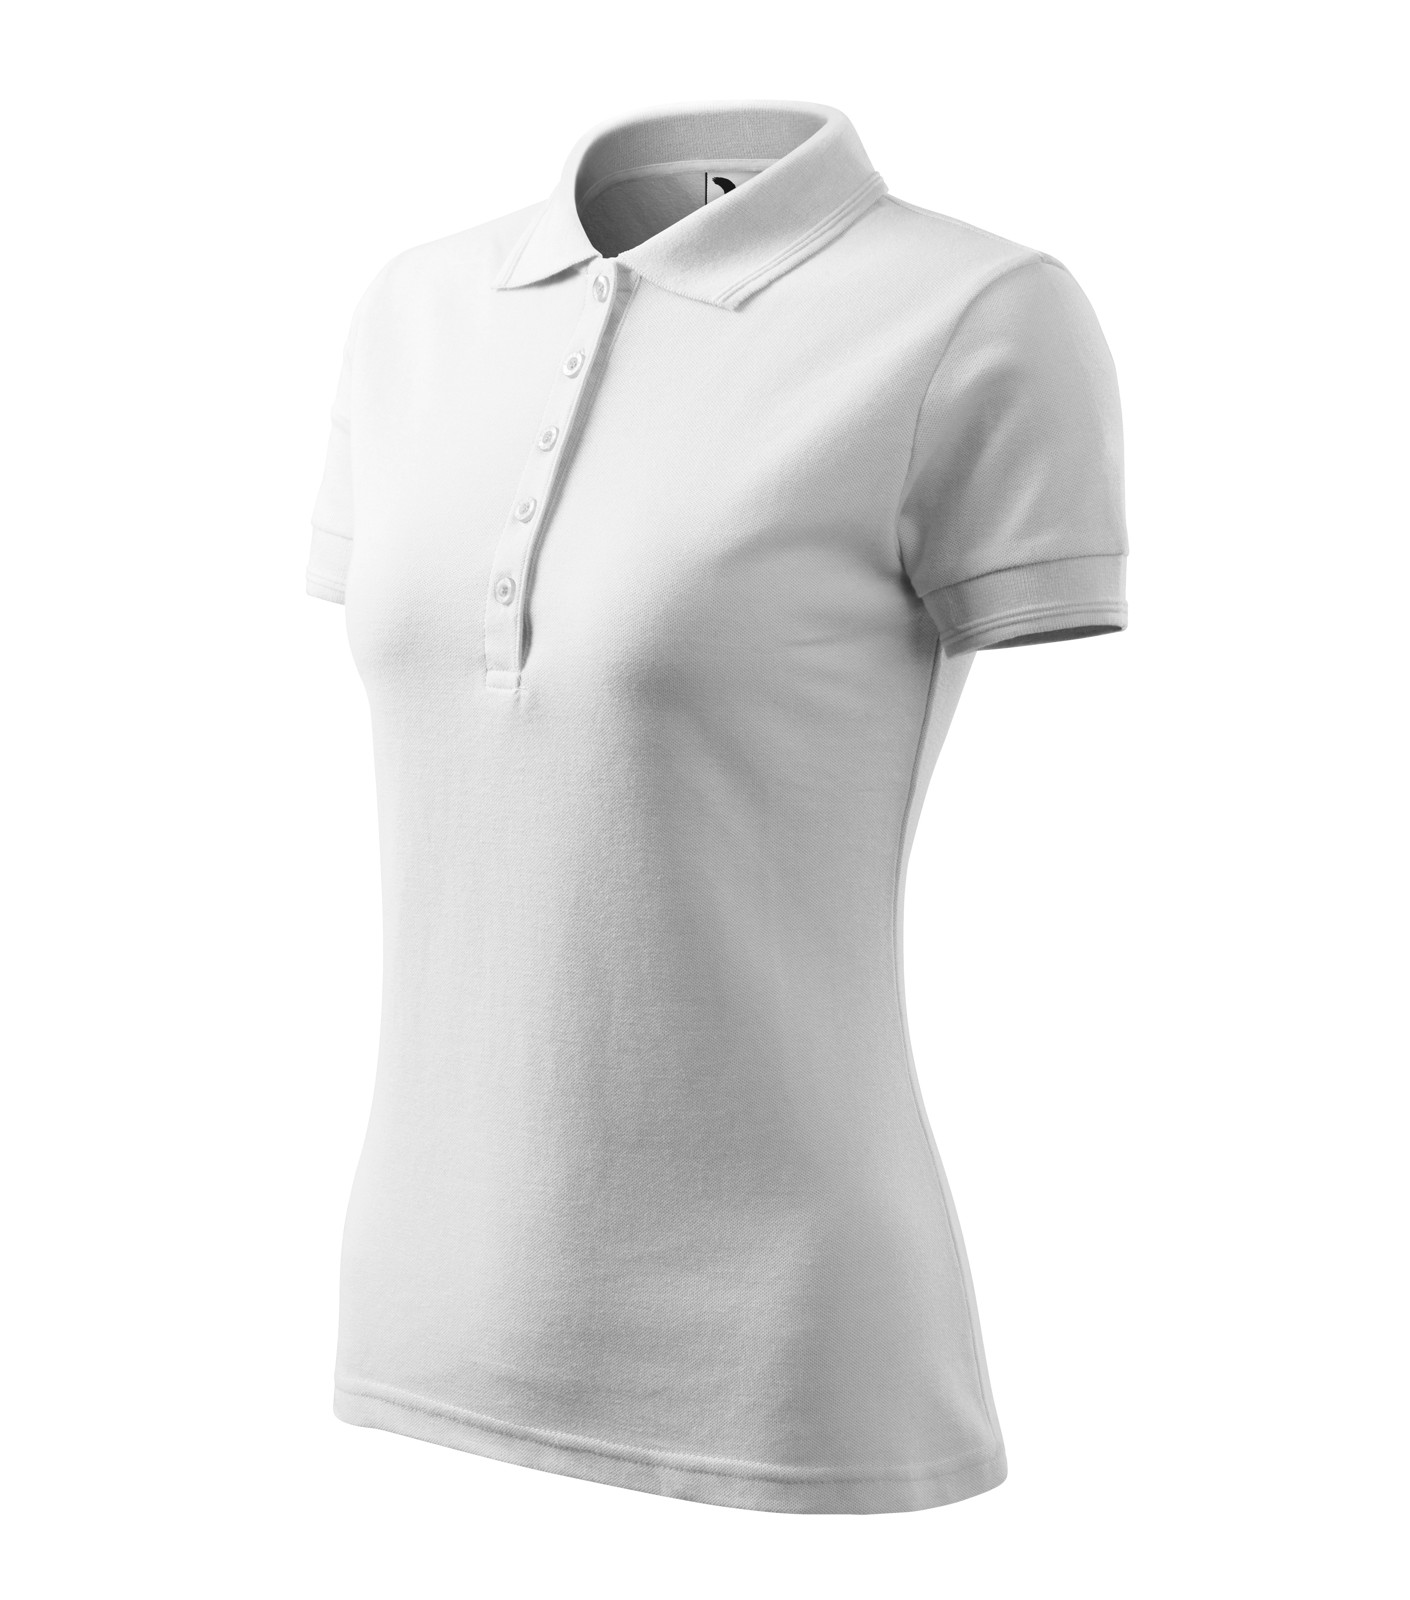 Polo Shirt women's Malfini Pique Polo - White / XS